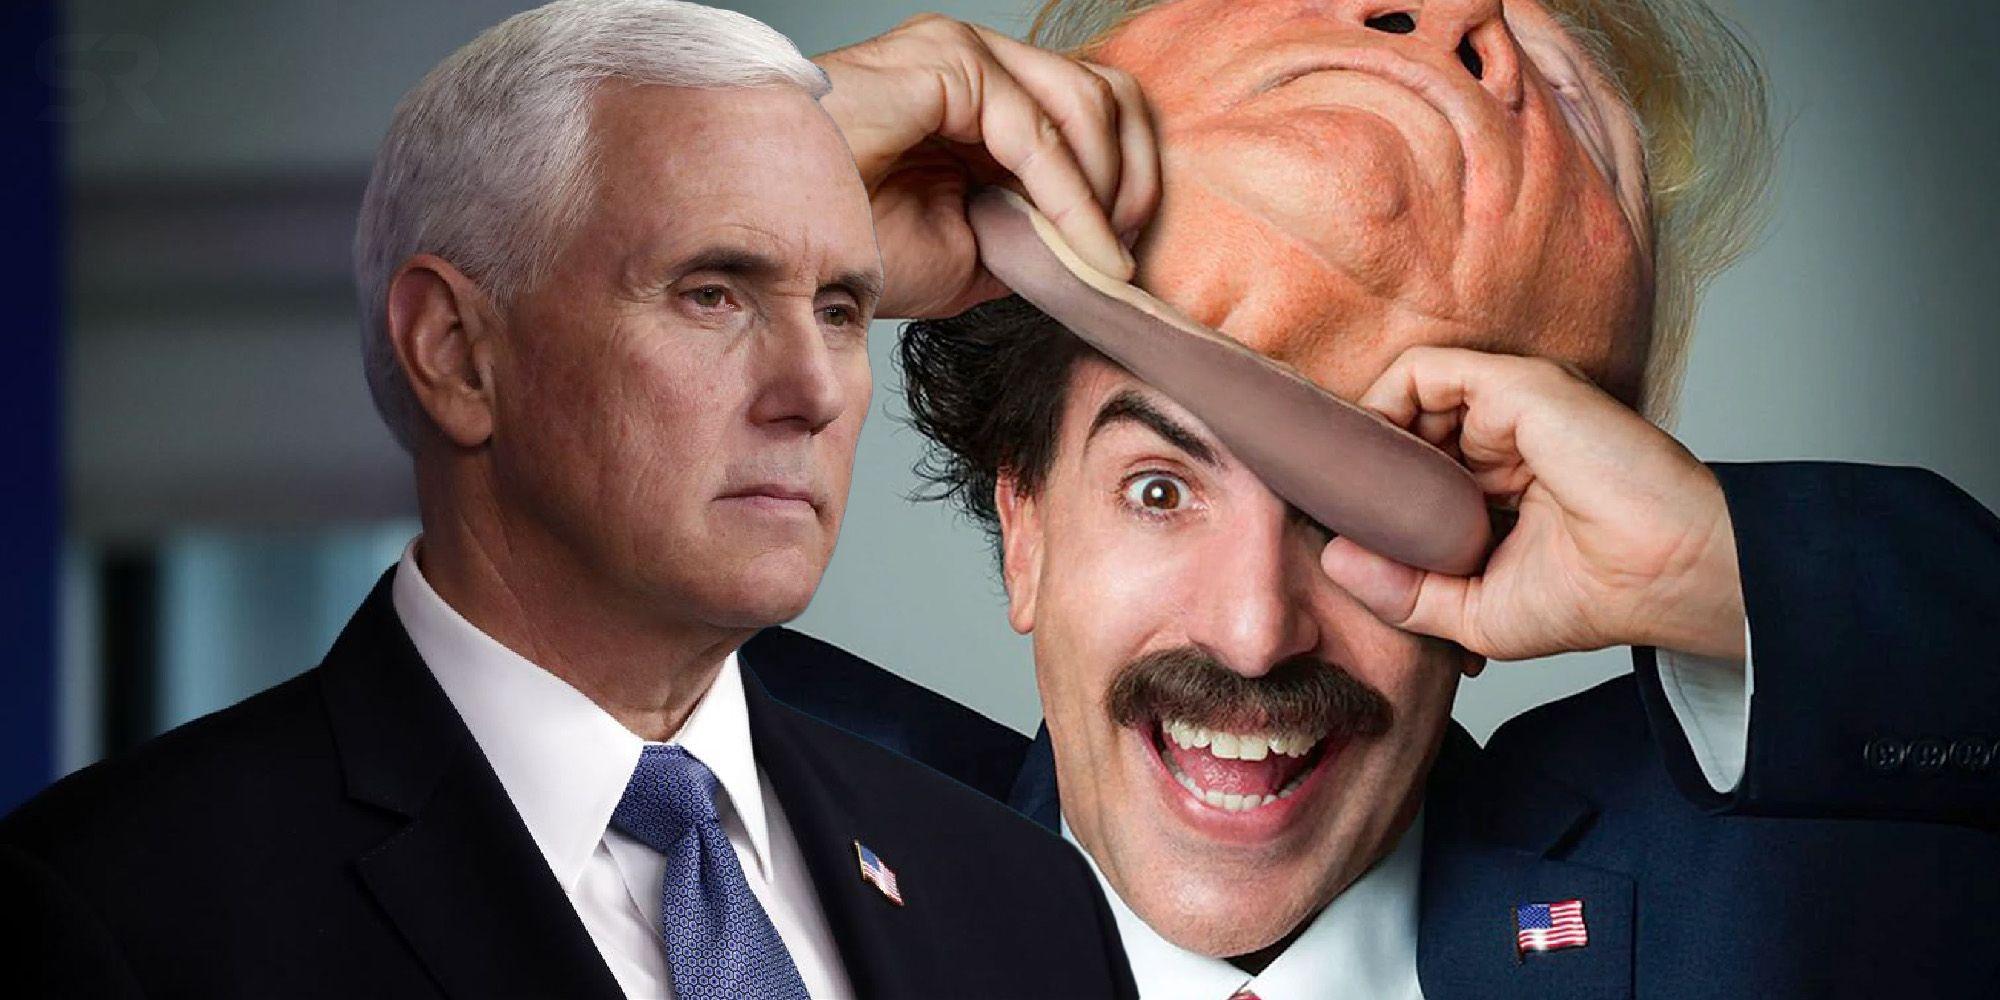 Borat 2: todas as celebridades mencionadas e zombadas 2